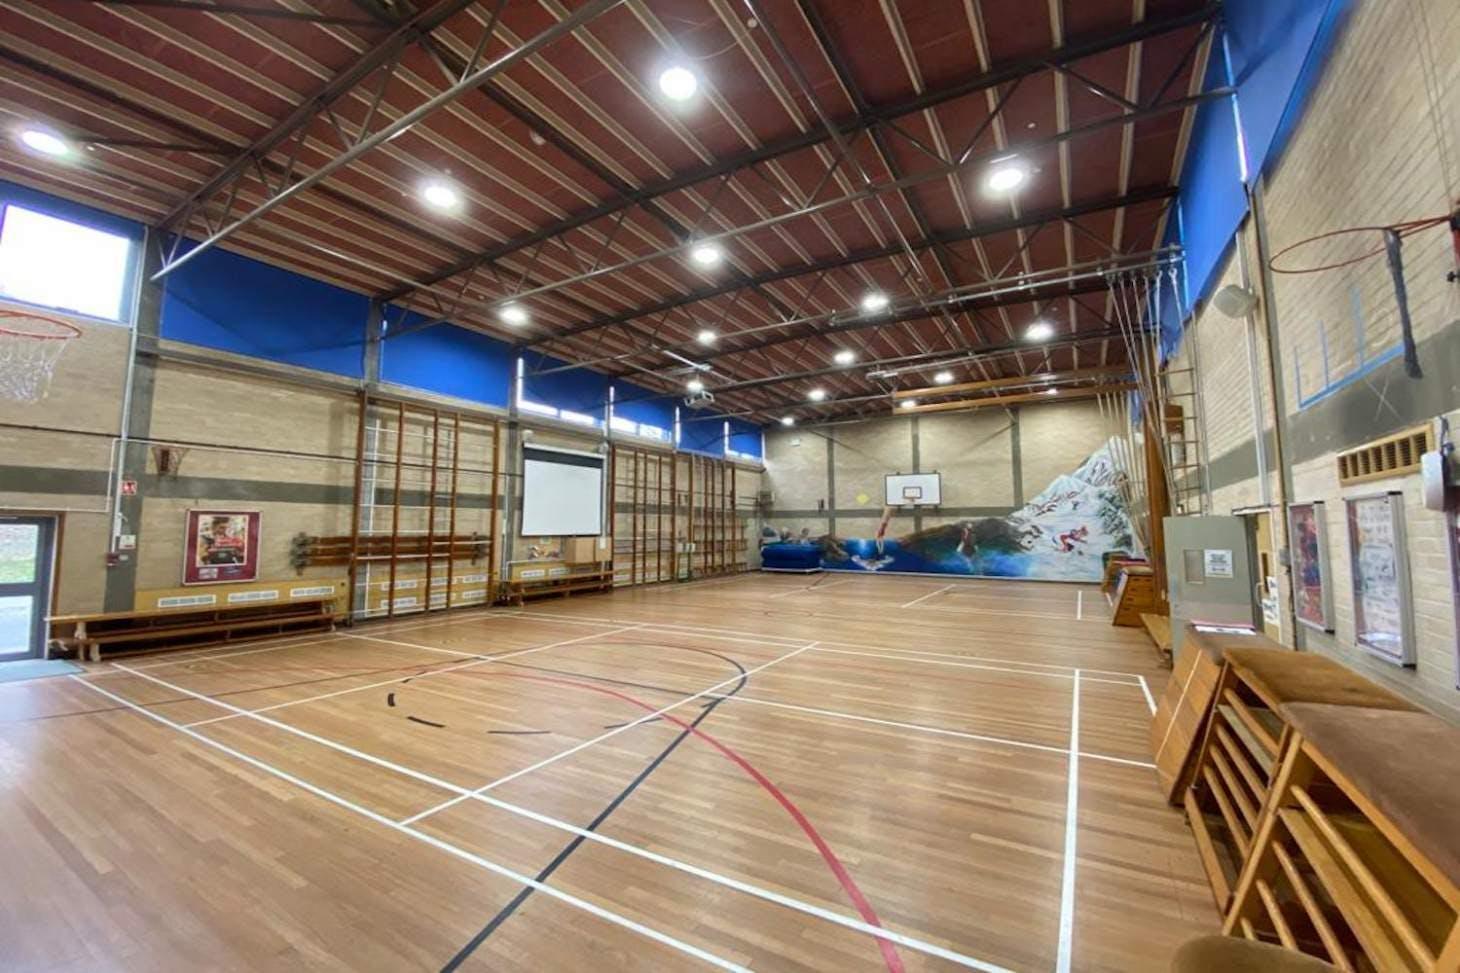 La Sainte Union School Court   Sports hall basketball court